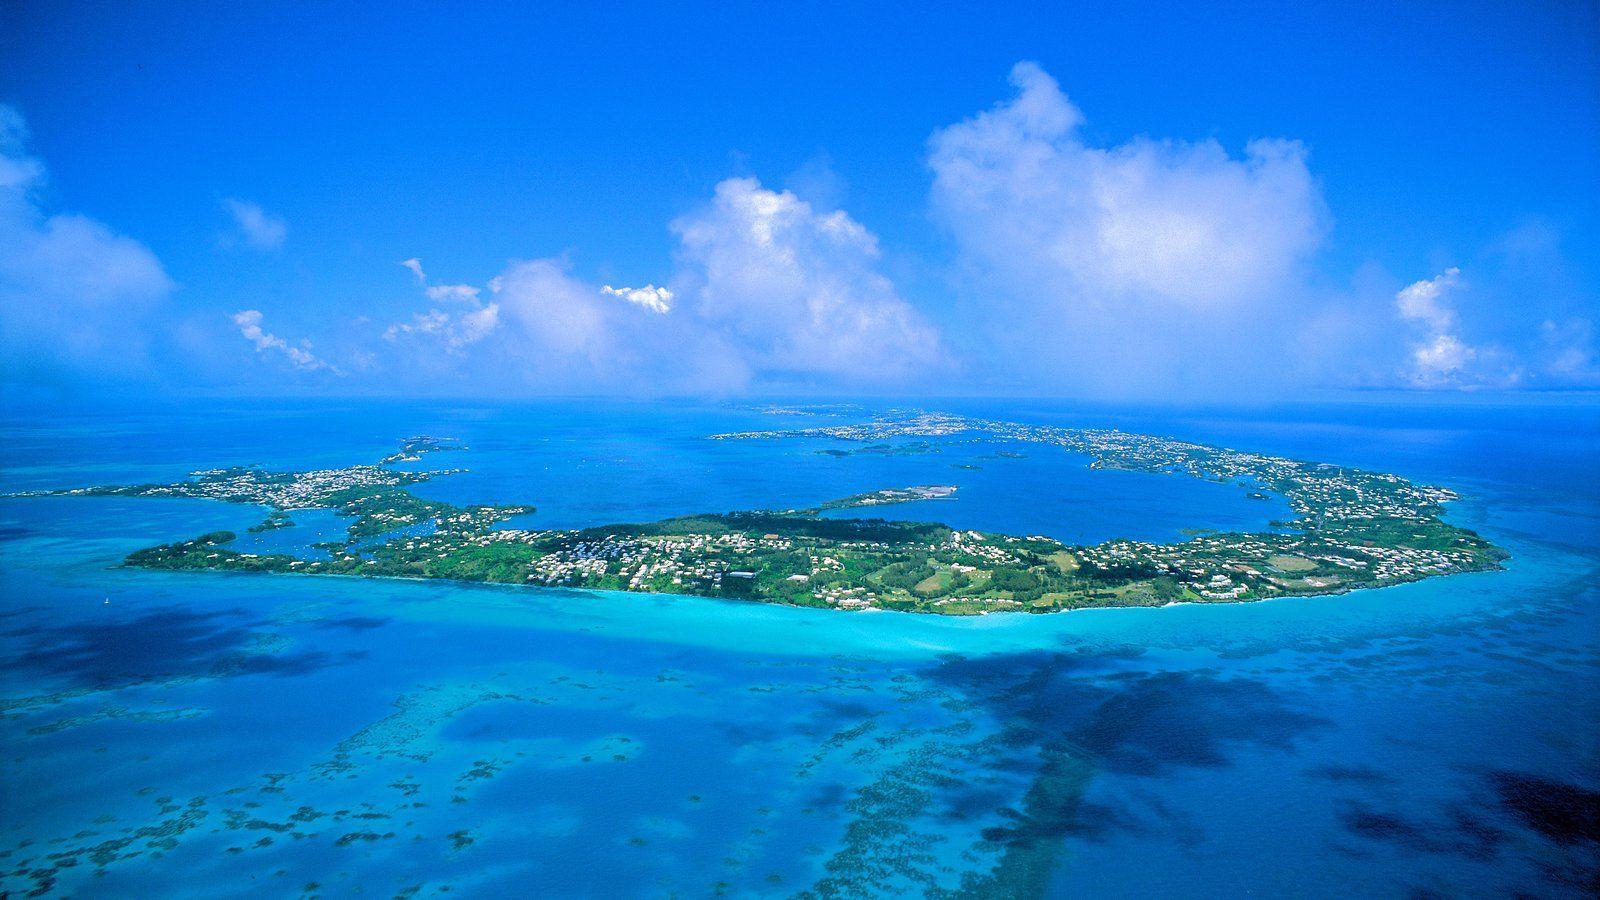 Bermuda Wallpapers Top Free Bermuda Backgrounds